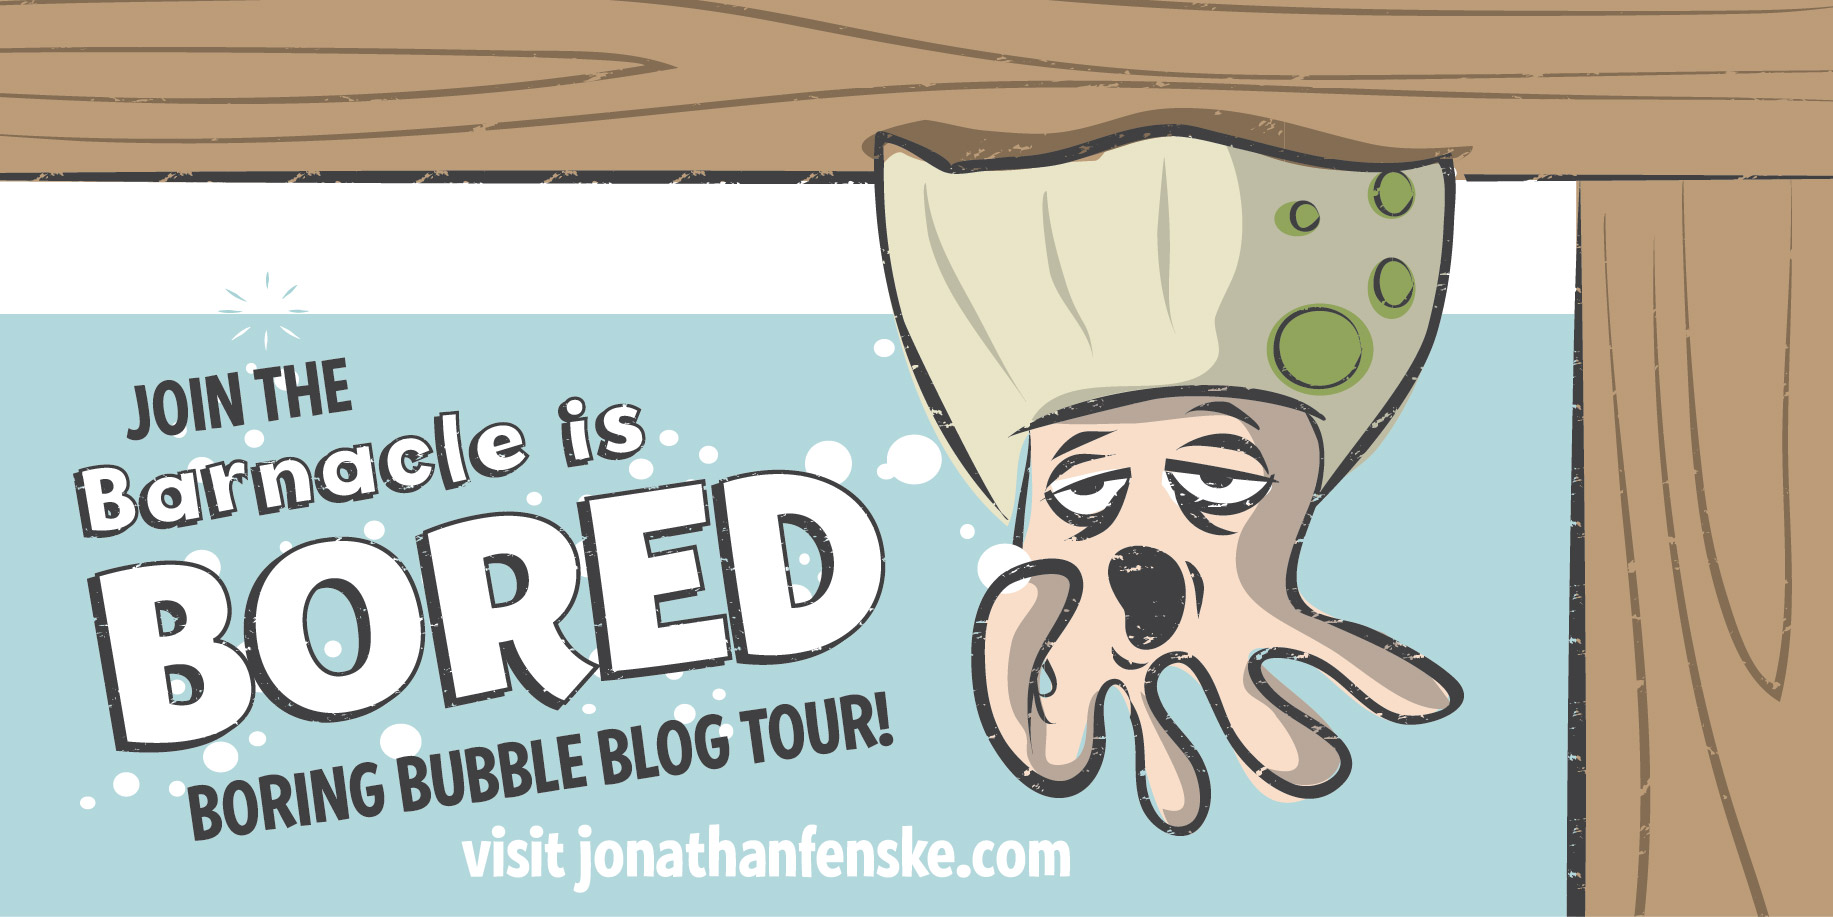 Jonathan-Fenske-blog-tour